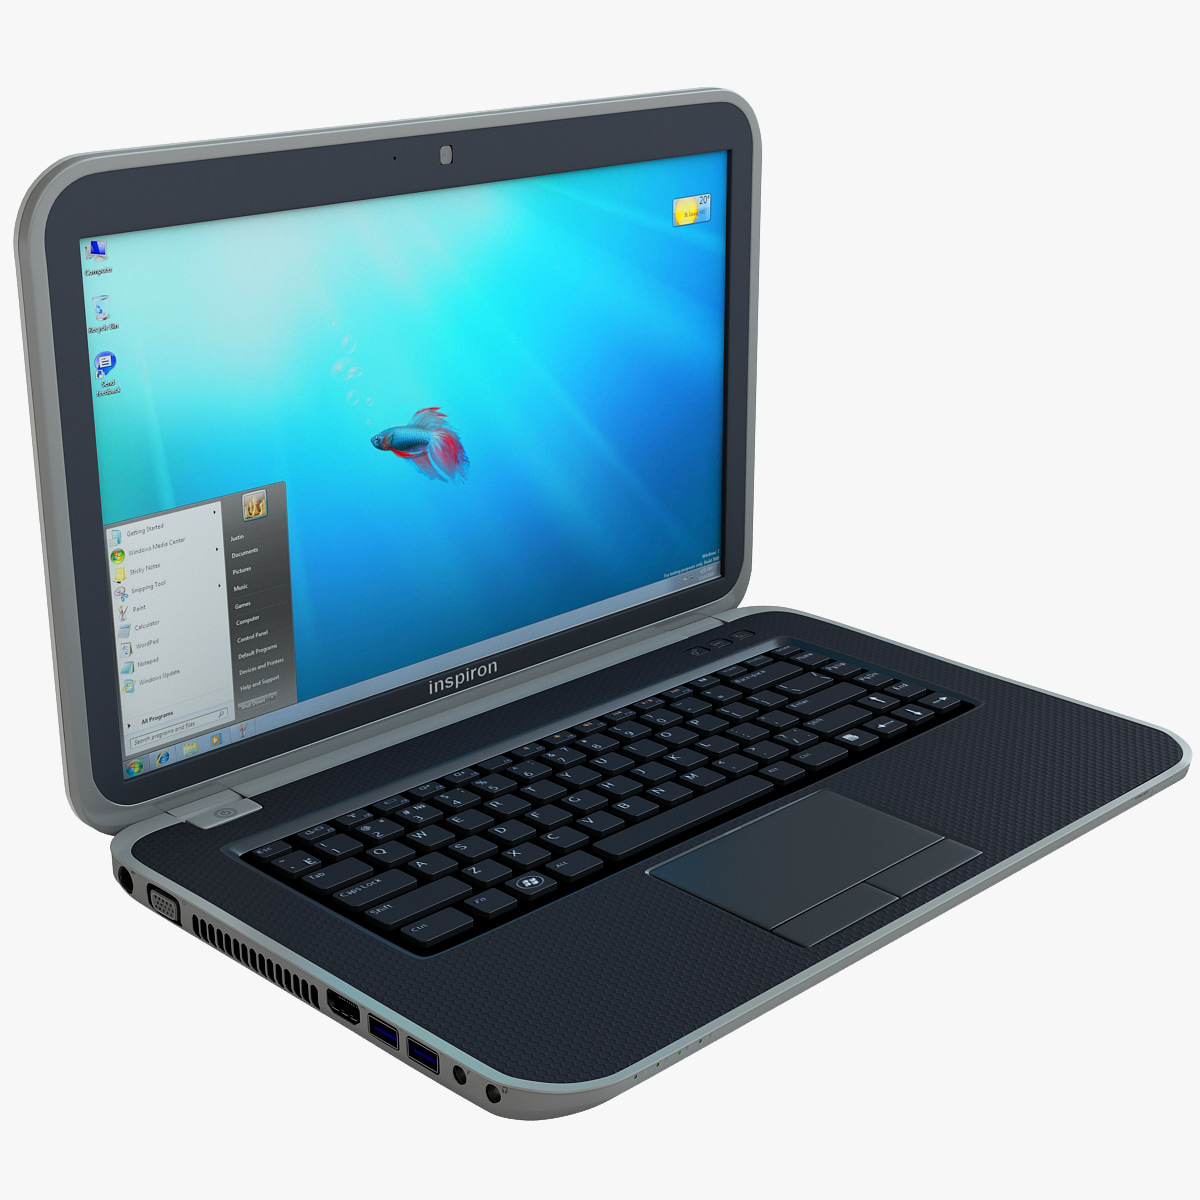 Laptop_Dell_Inspiron_7520_000.jpg